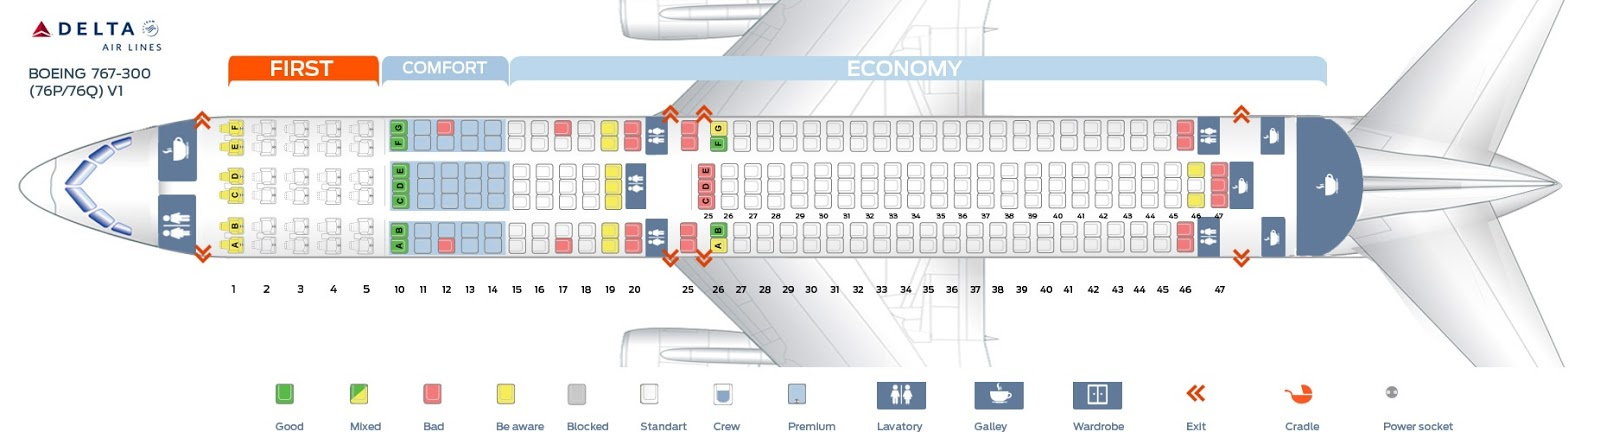 ✓ Beautiful Delta Boeing 767-300 Seat Map - Seat Inspiration on